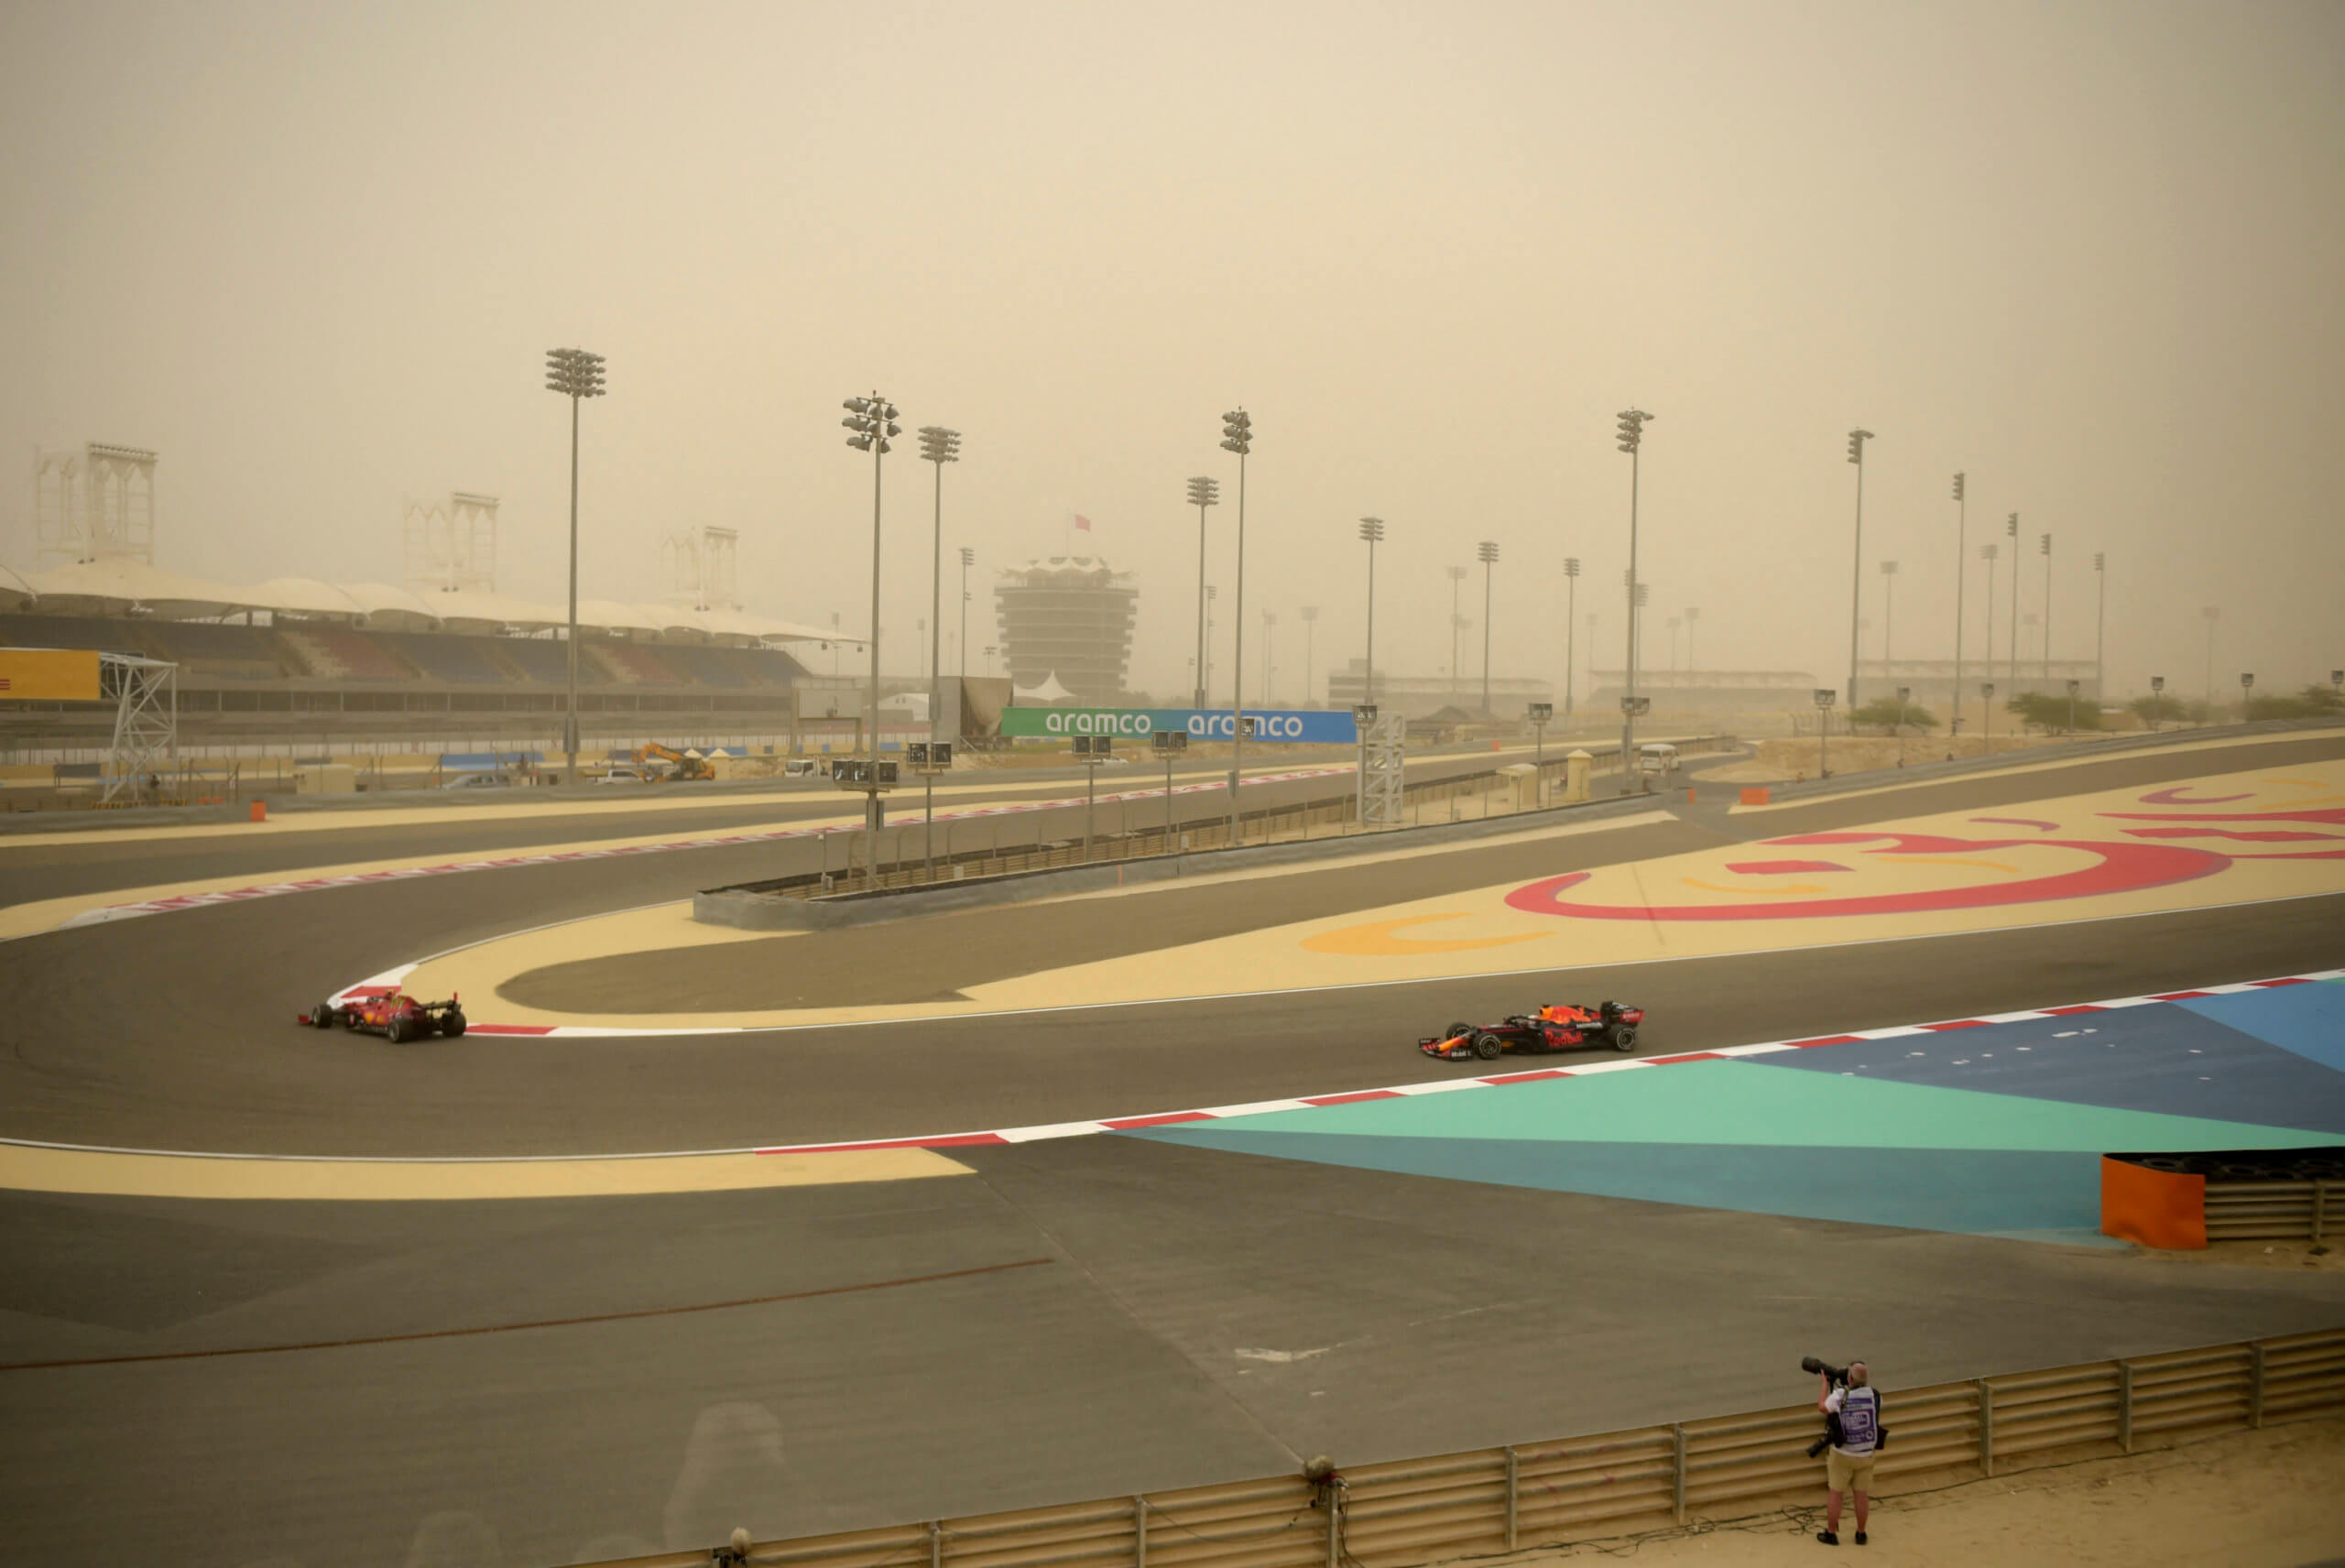 Bahrain Grand Prix, Formula 1 Preview: Bahrain Grand Prix